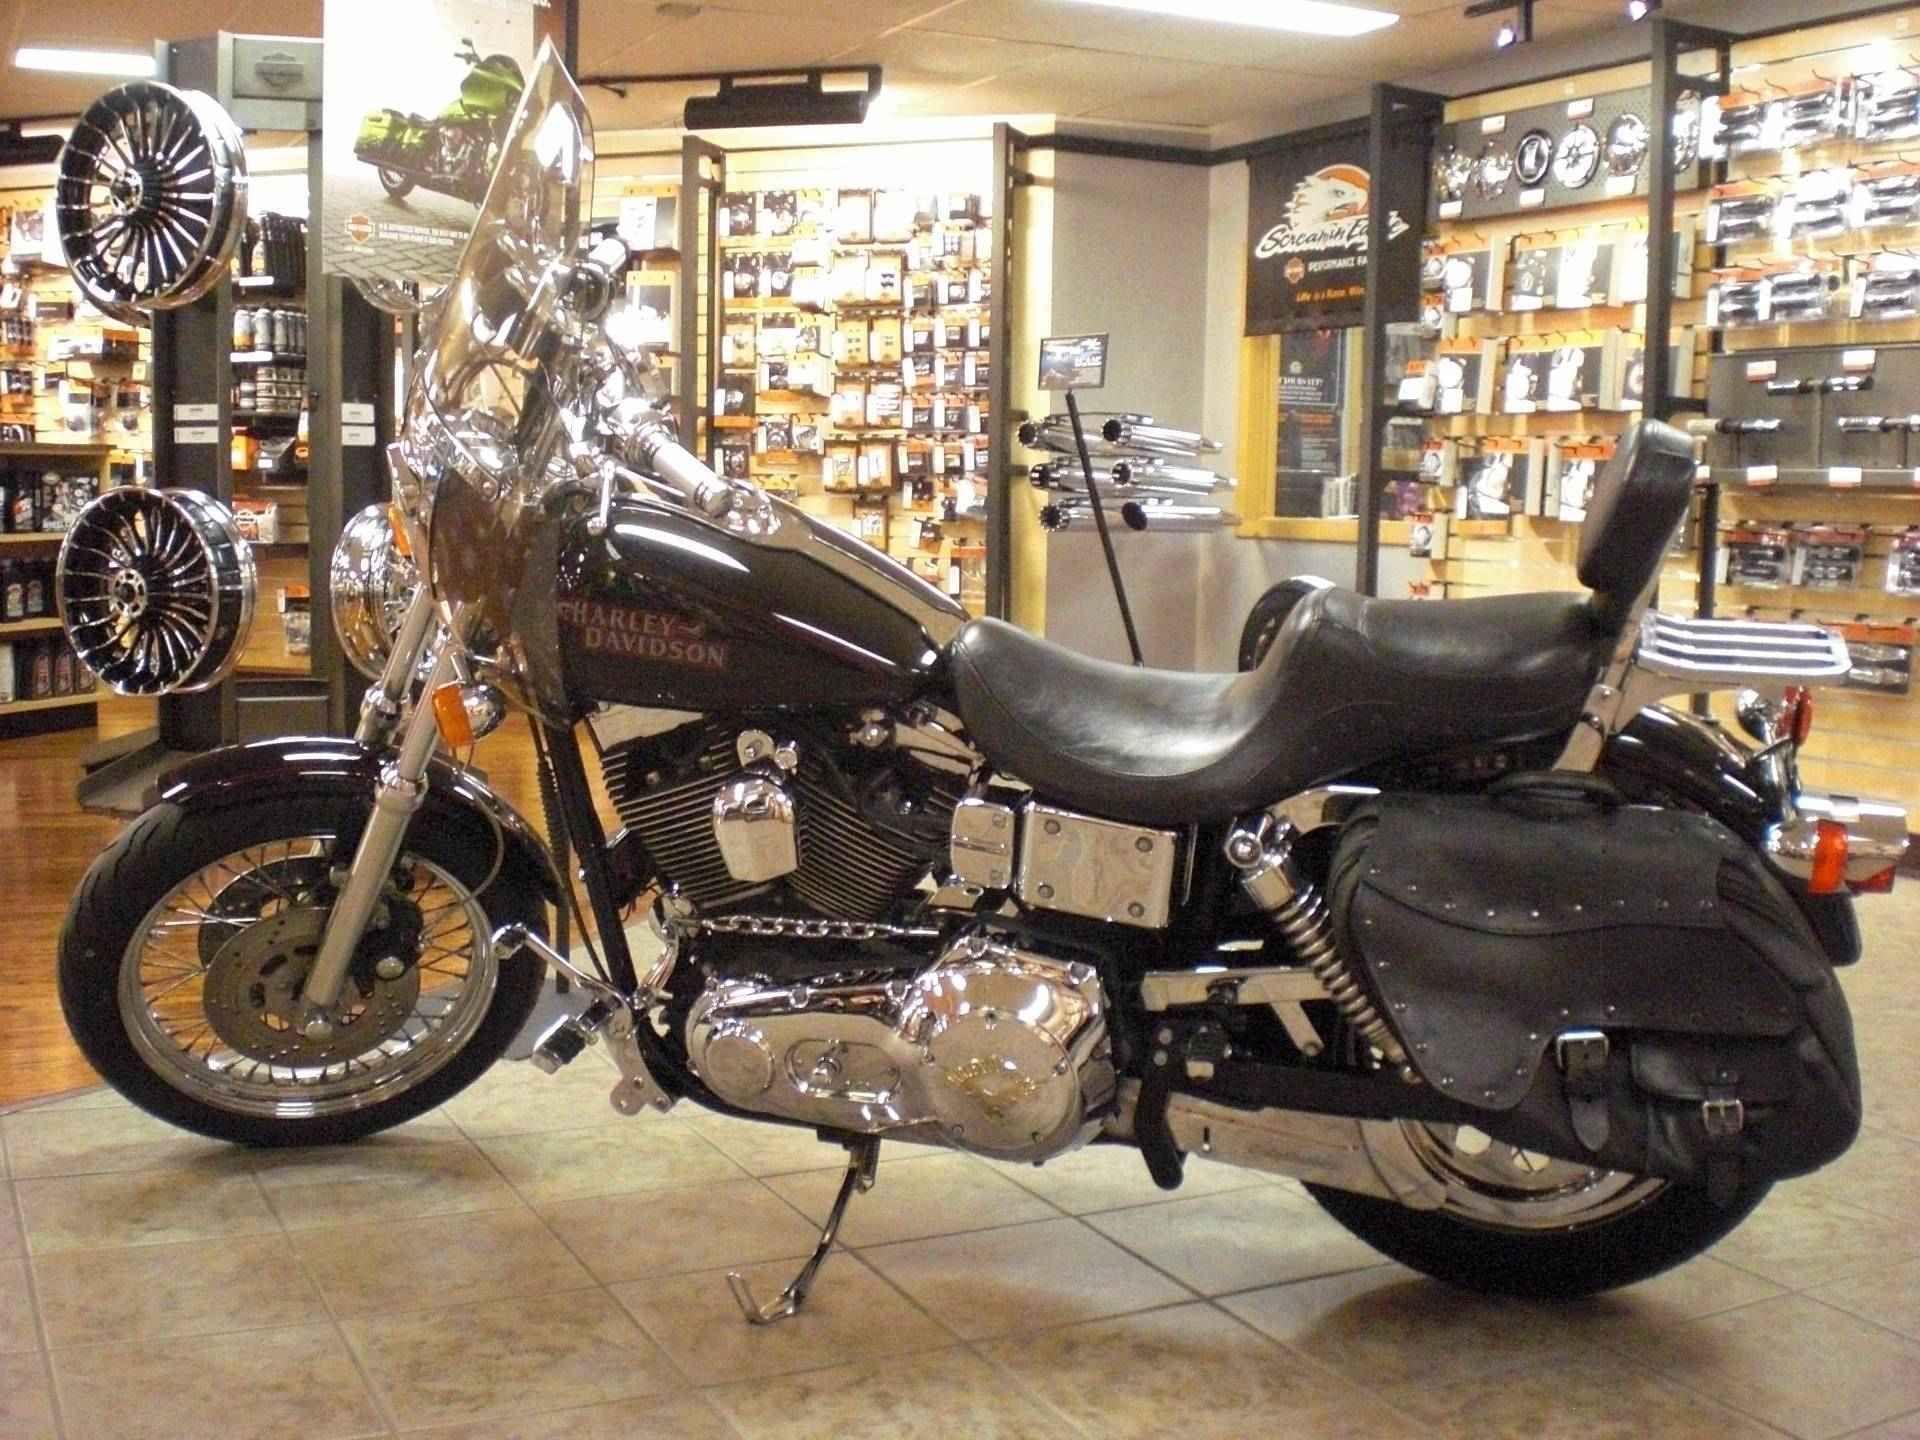 1999 Harley Davidson Fxds Conv Dyna Convertible Harley Davidson Harley Road Glide Special [ 1440 x 1920 Pixel ]